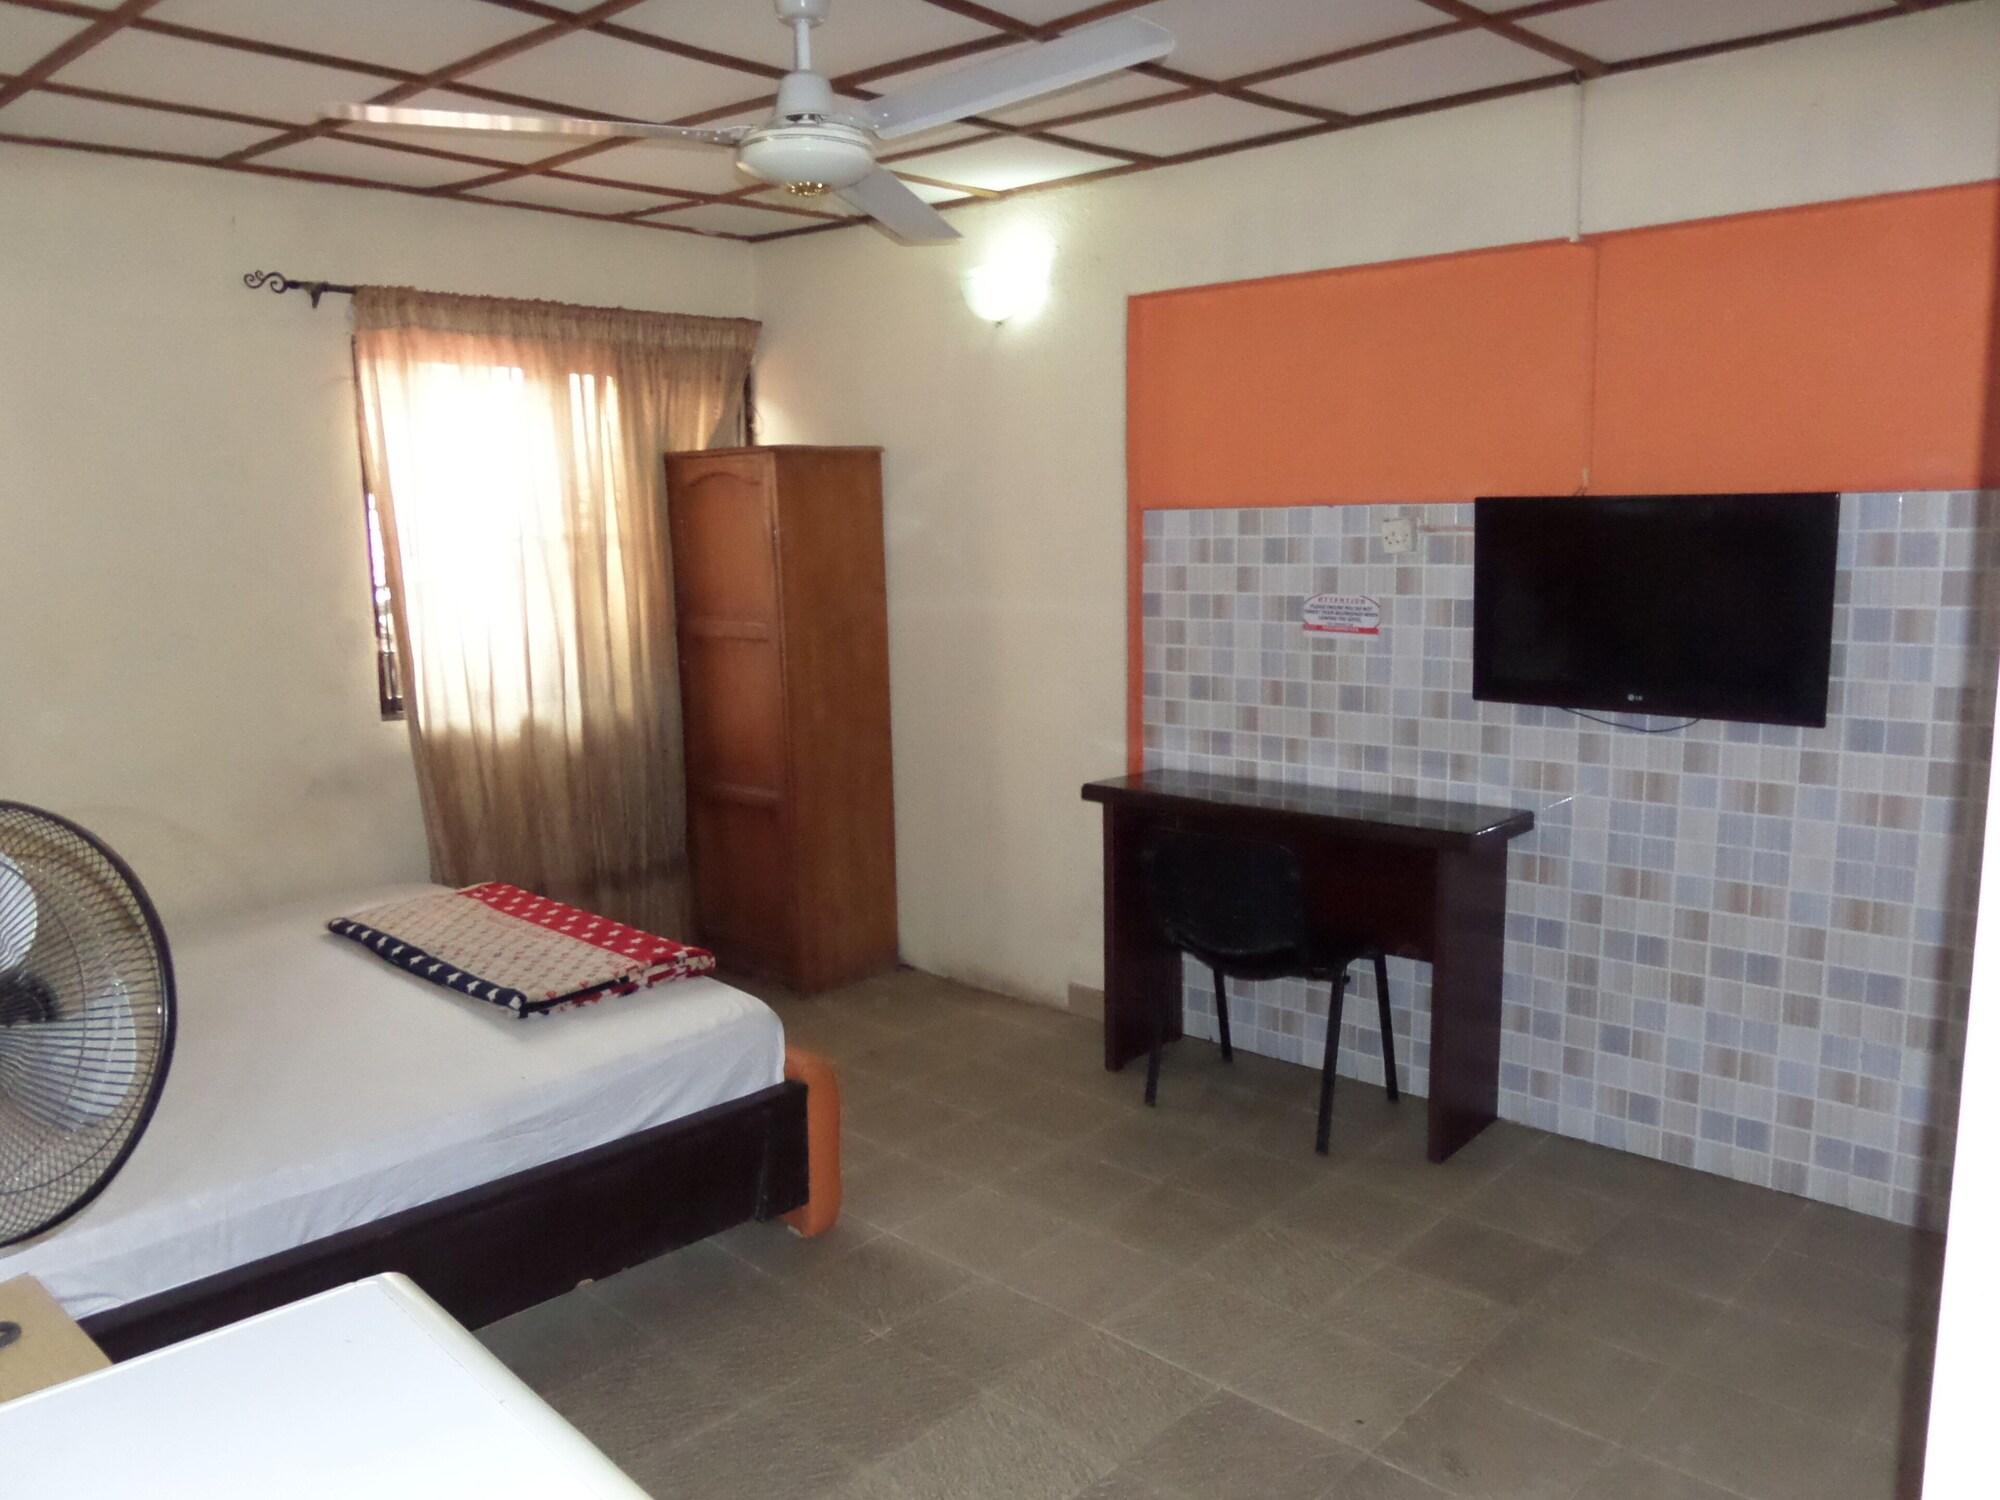 Metro Apartment Bodija Ibadan, IbadanNorth